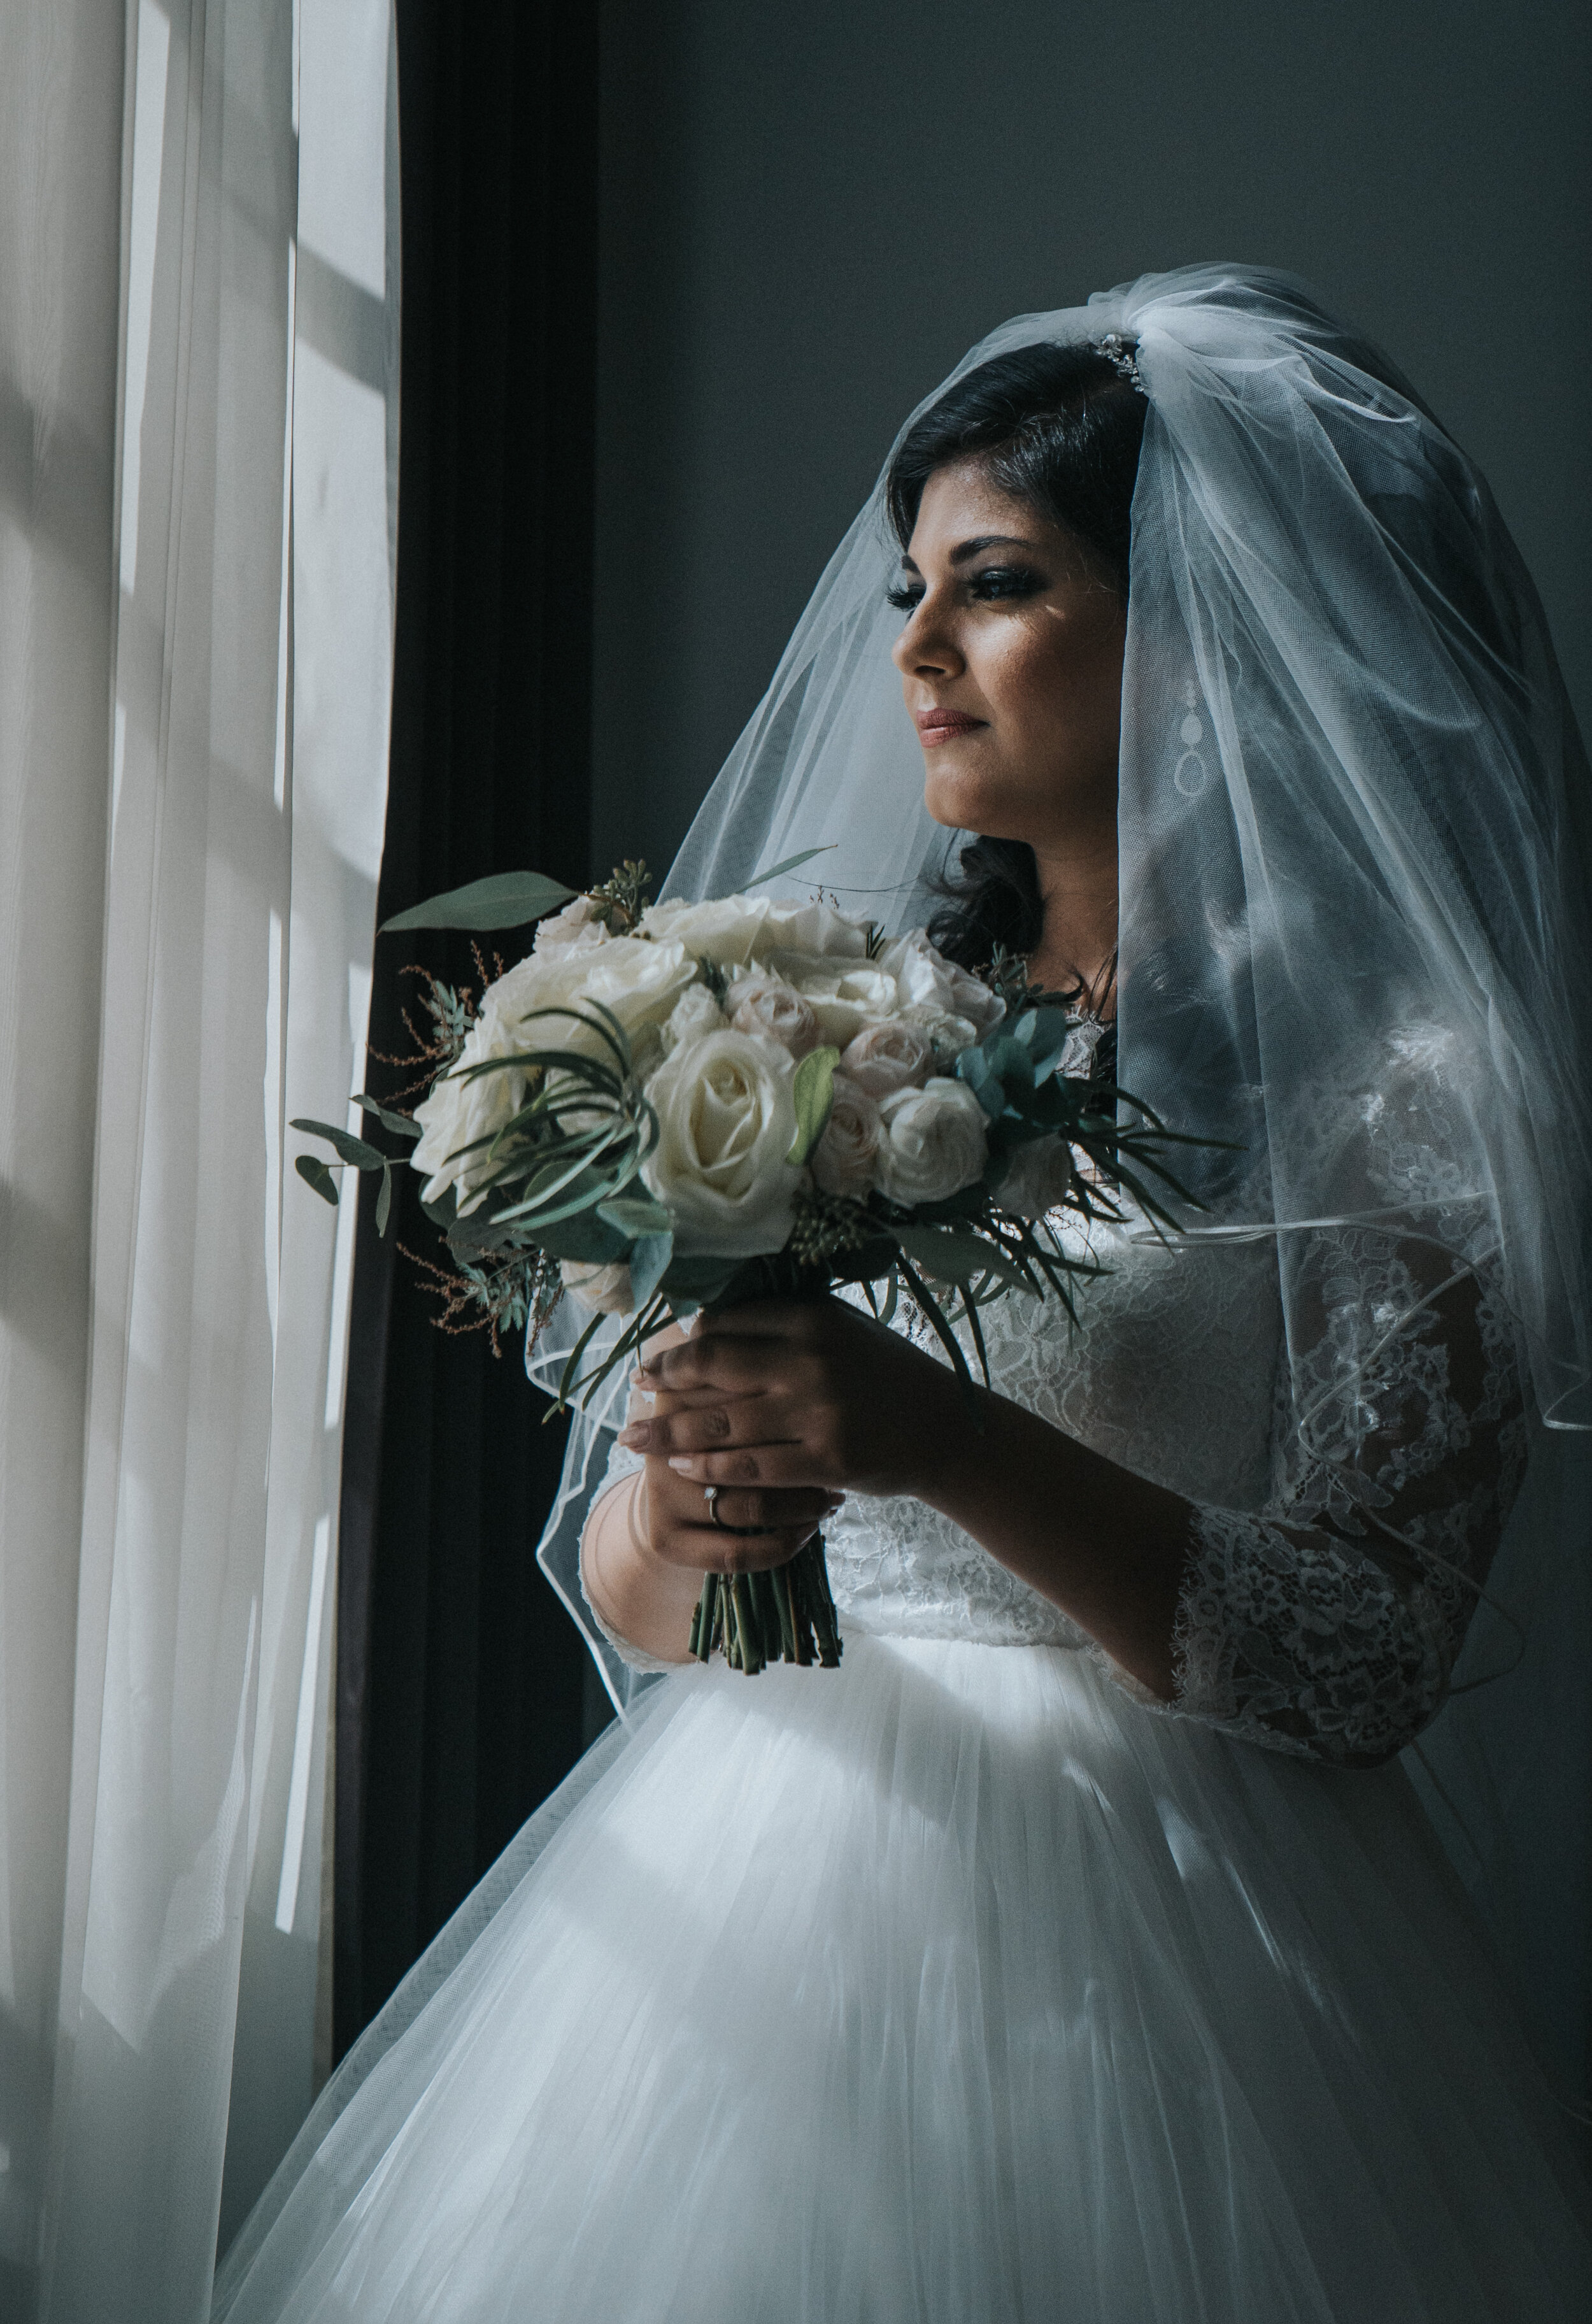 bride-prep-hackney-london-wedding-photographer-04